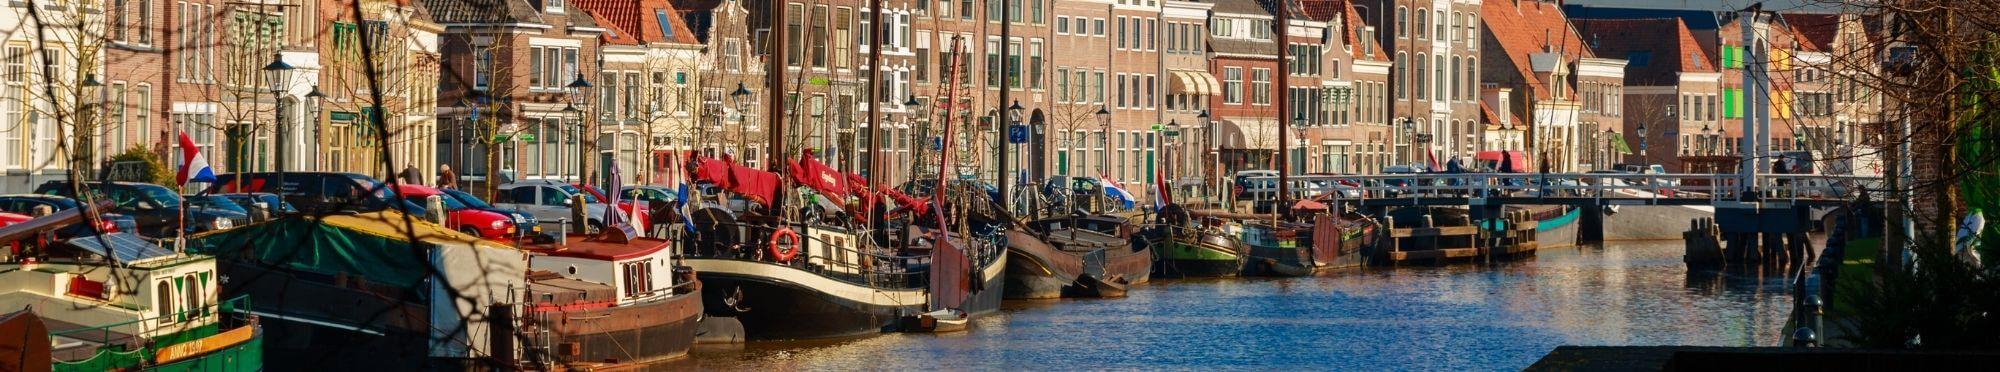 Echtscheidingsadvocaat Zwolle